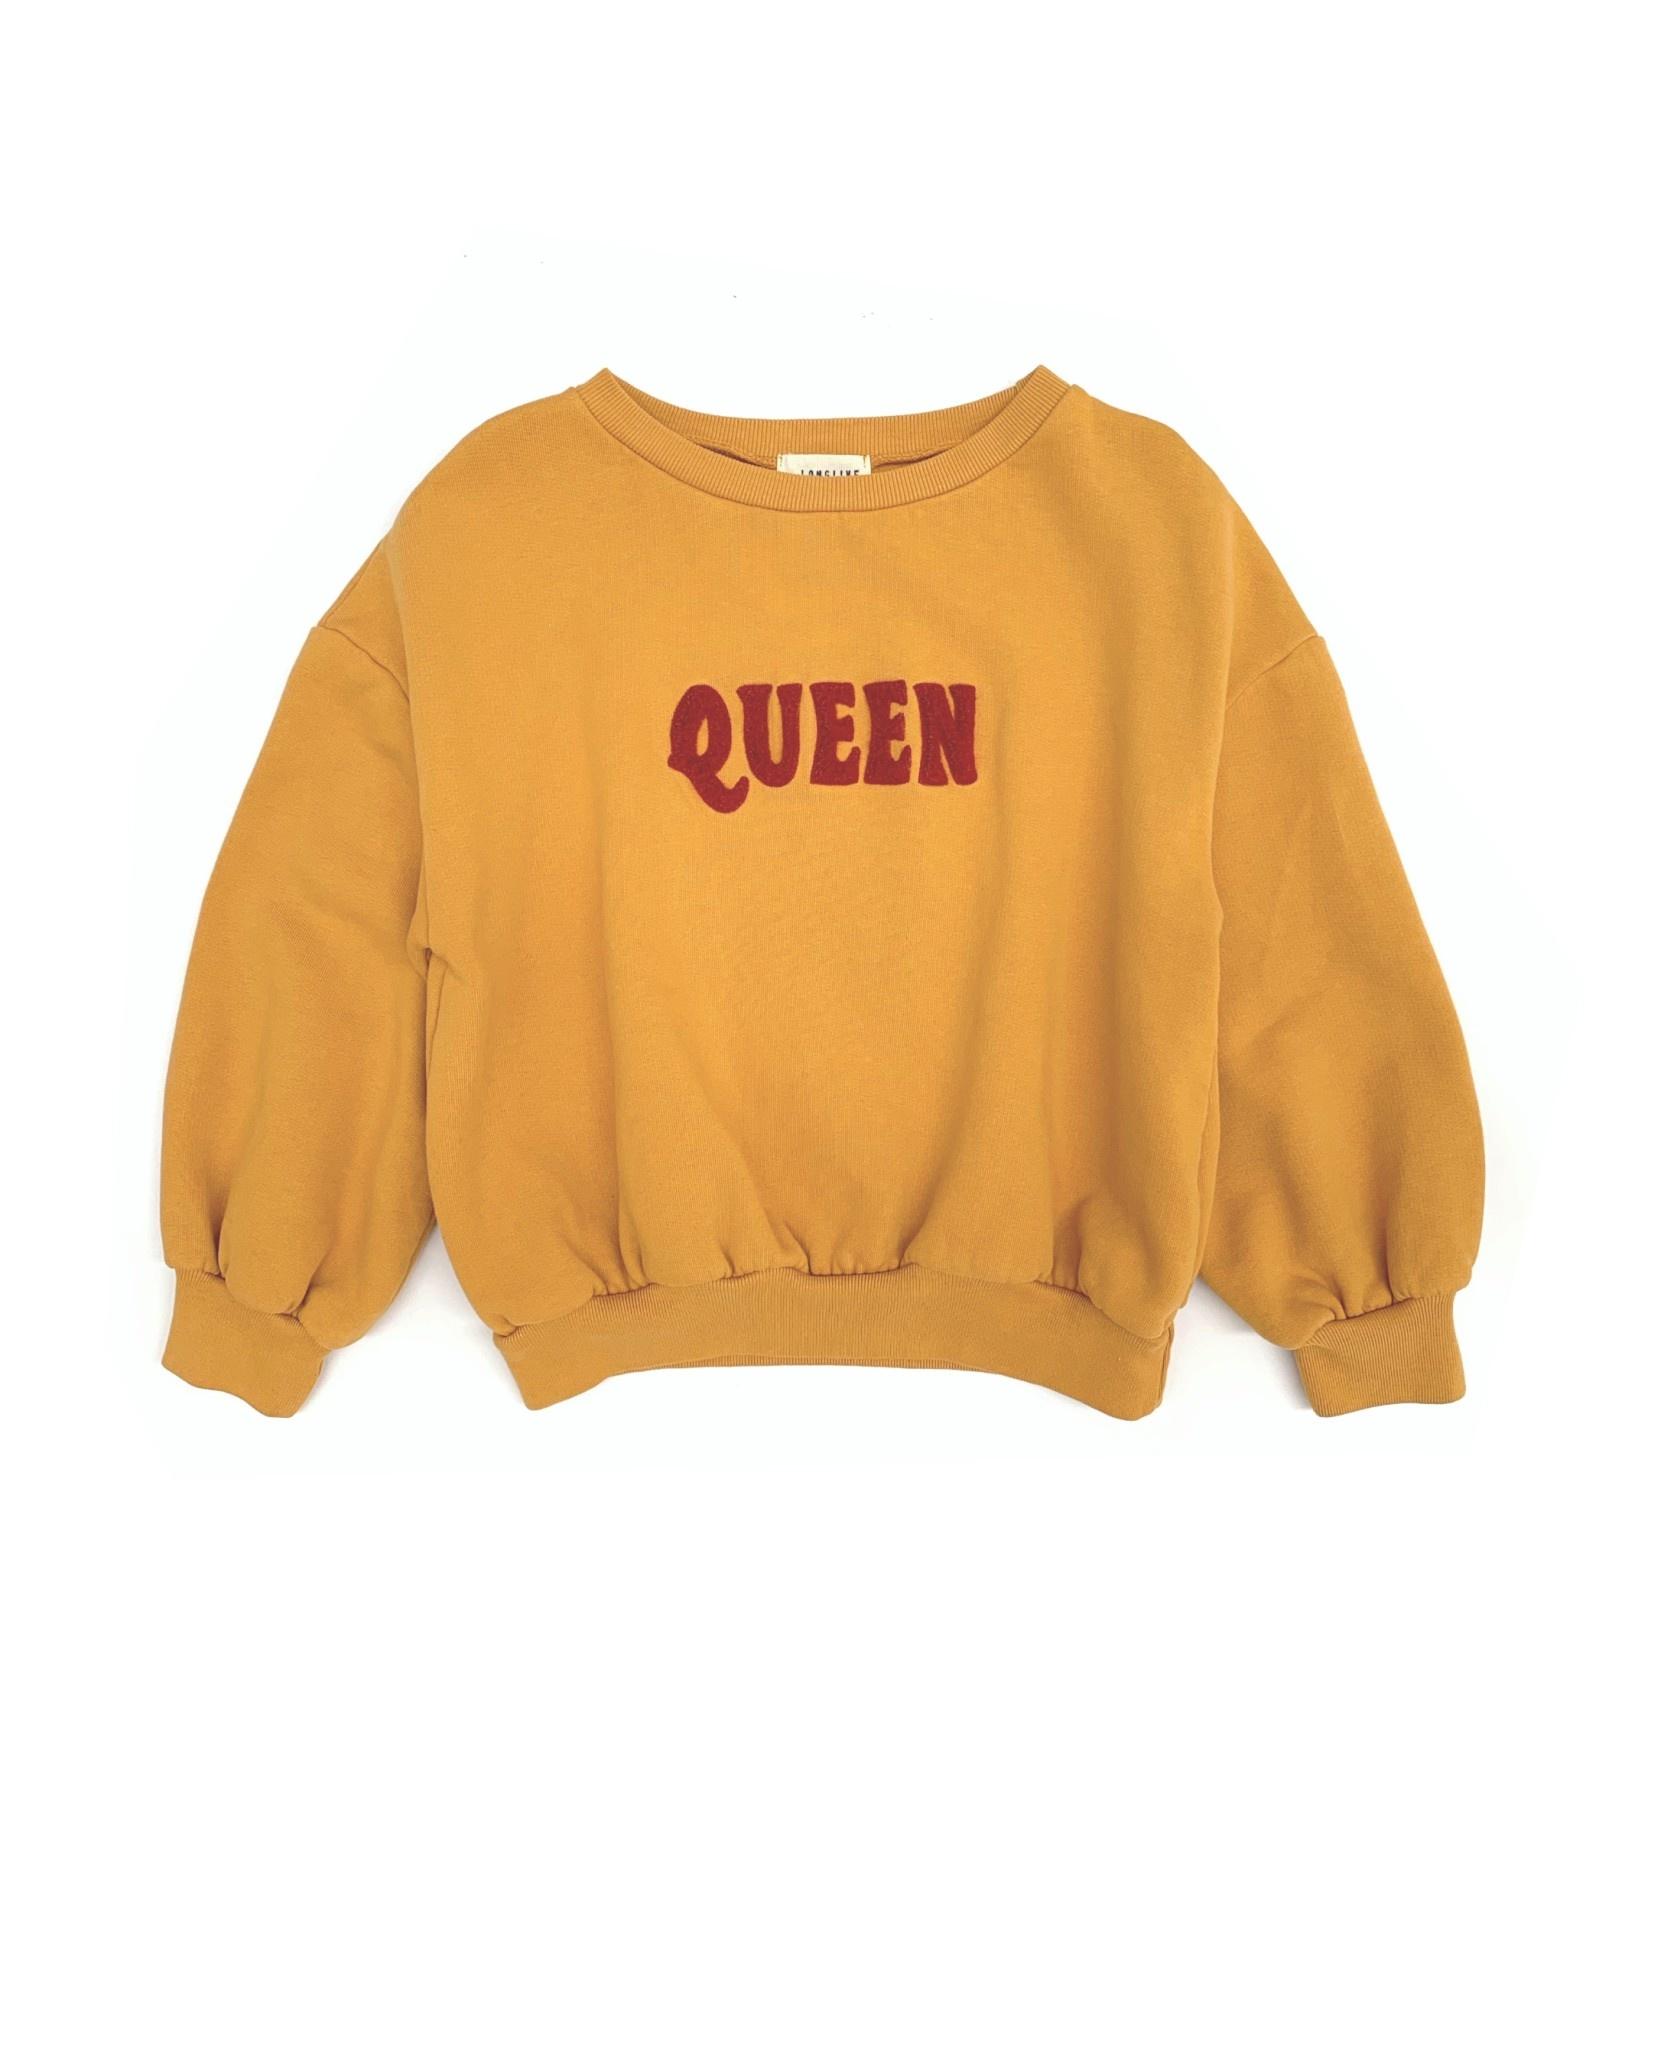 Sweater golden yellow-1